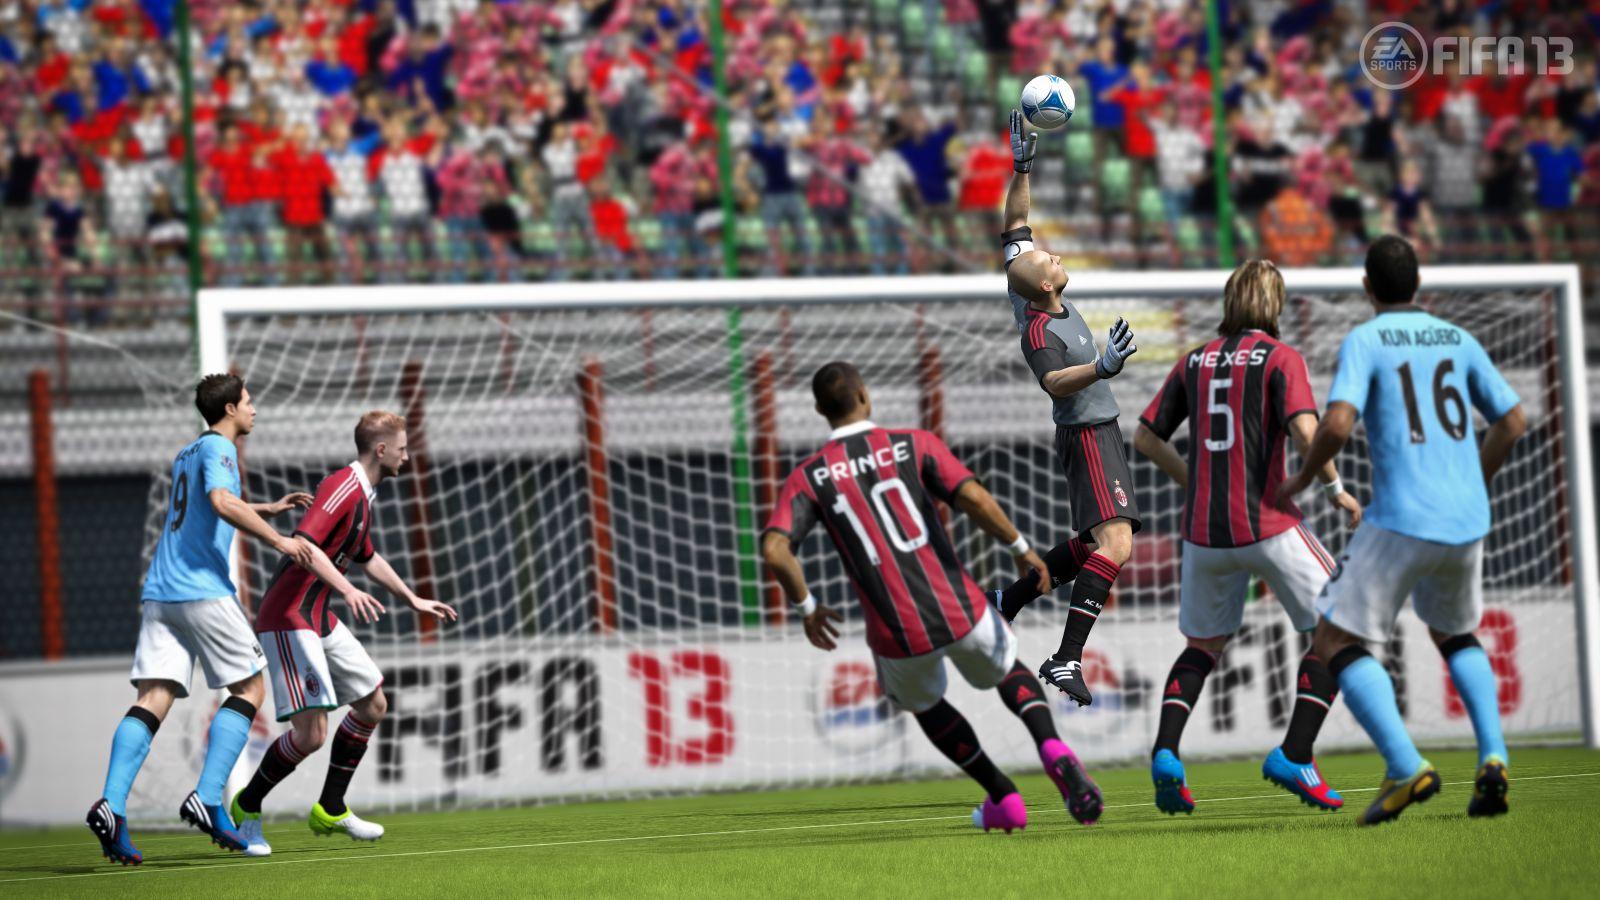 FIFA 13: dojmy z prezentace z Edenu 68886